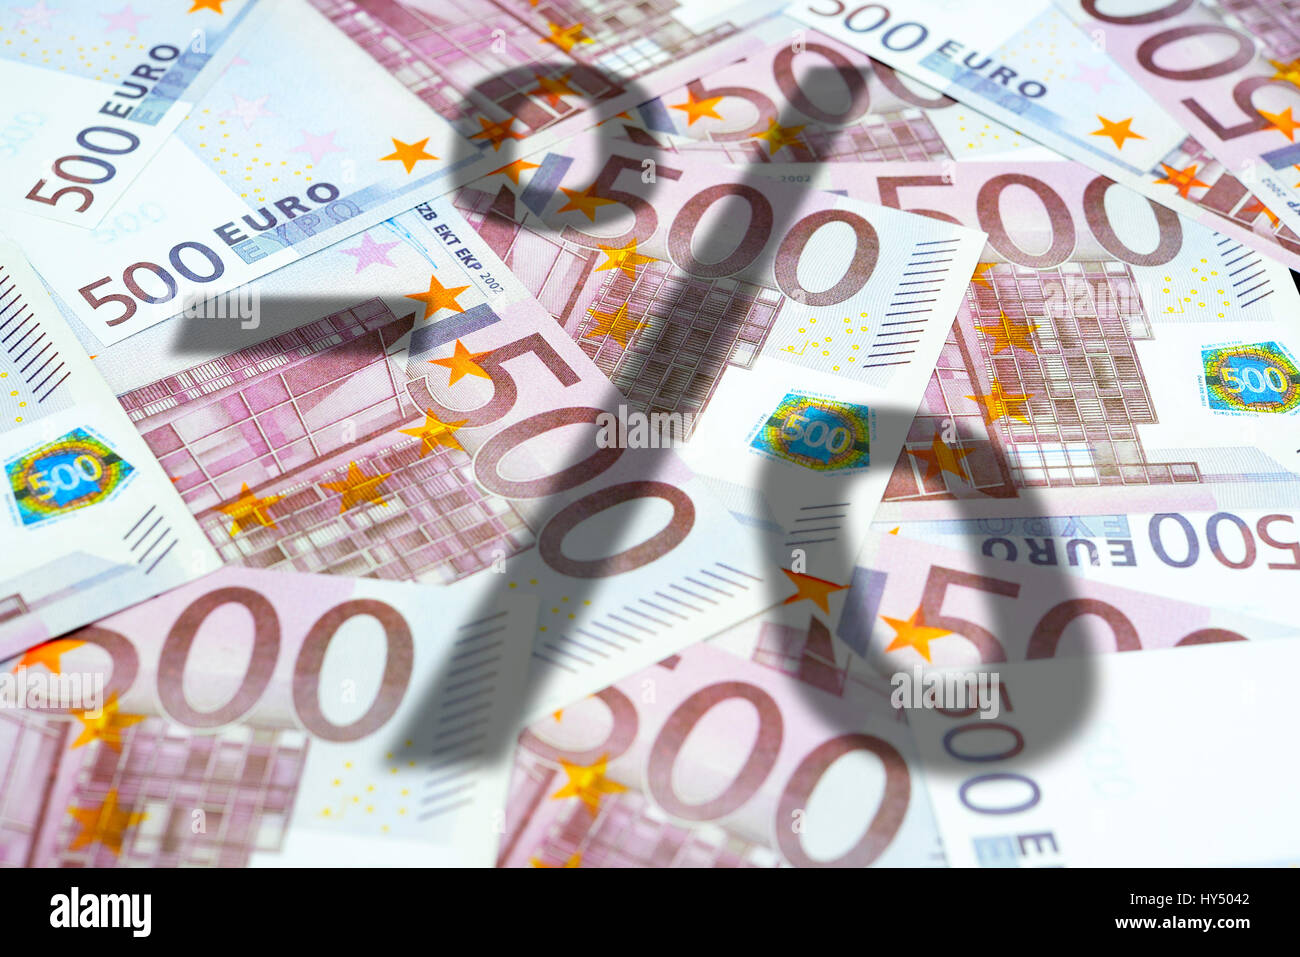 Negative percent sign on 500-euro-bank notes, symbolic photo negative interest, Negatives Prozentzeichen auf 500 Stock Photo